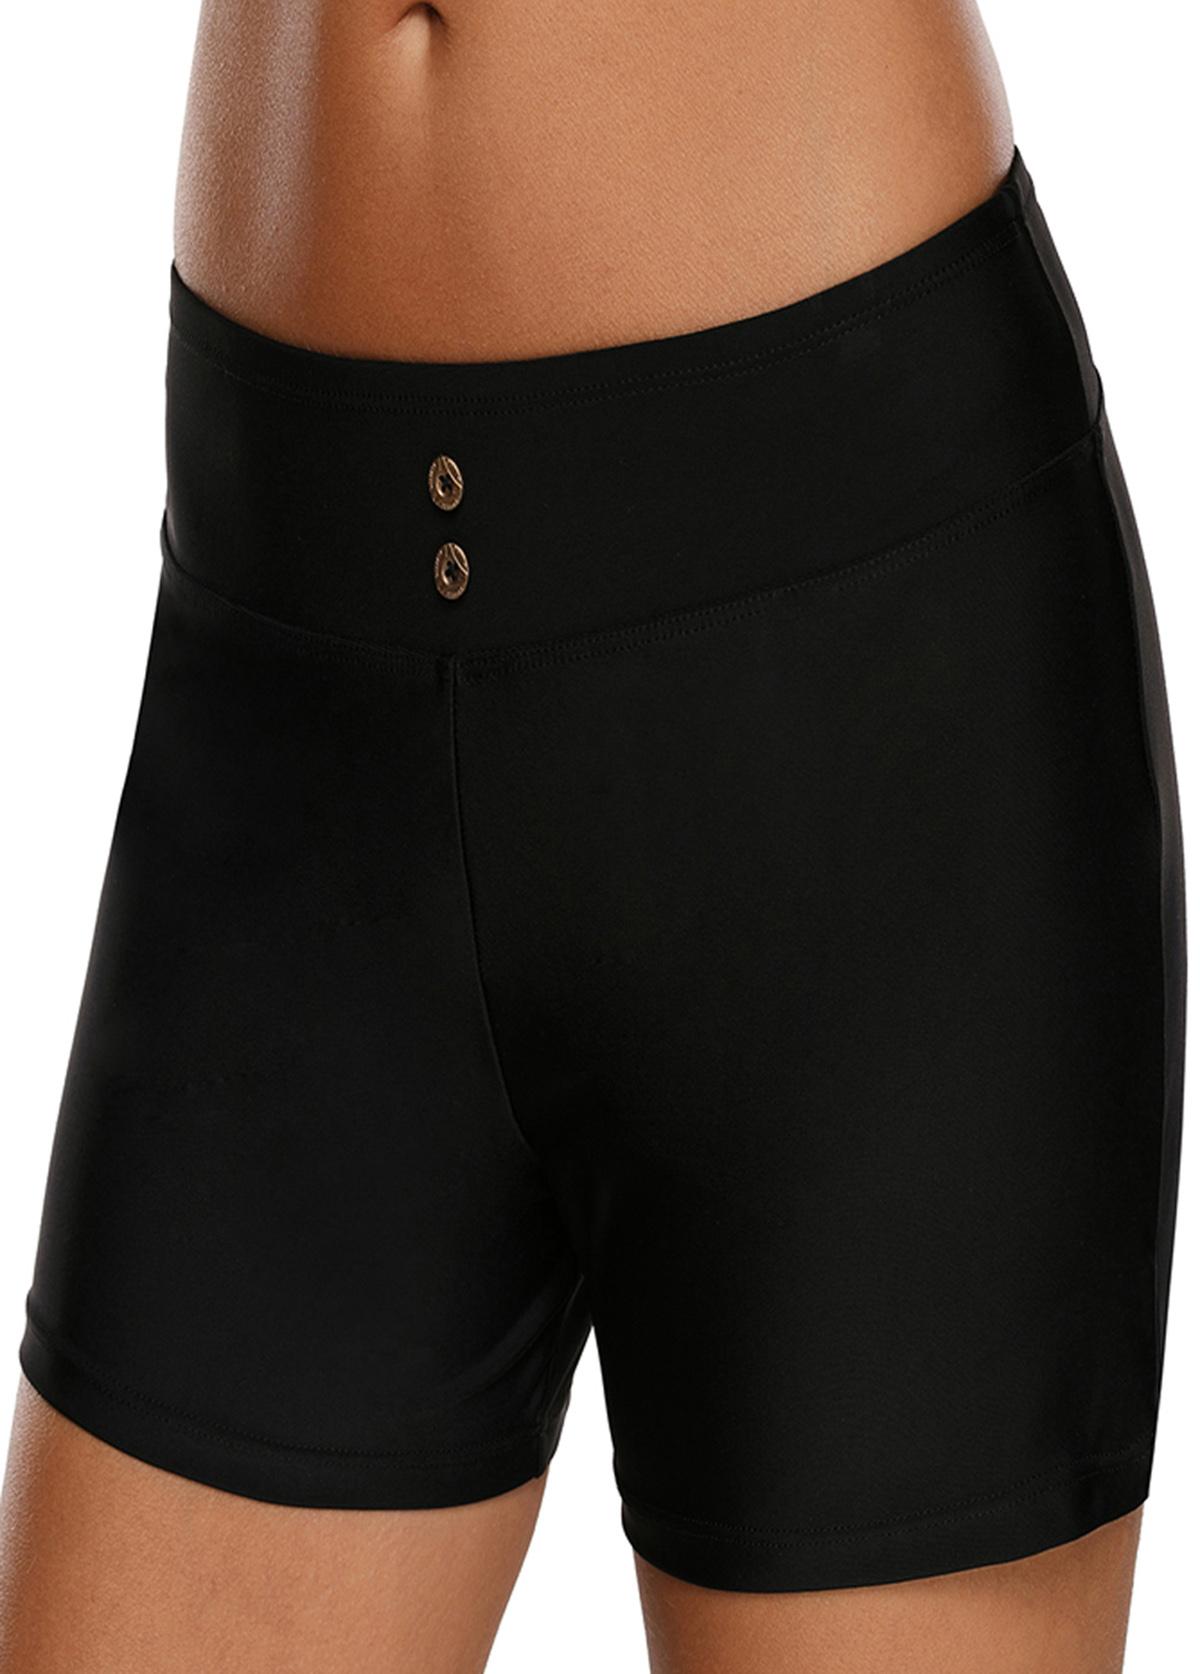 Band Waist Solid Black Swimwear Shorts